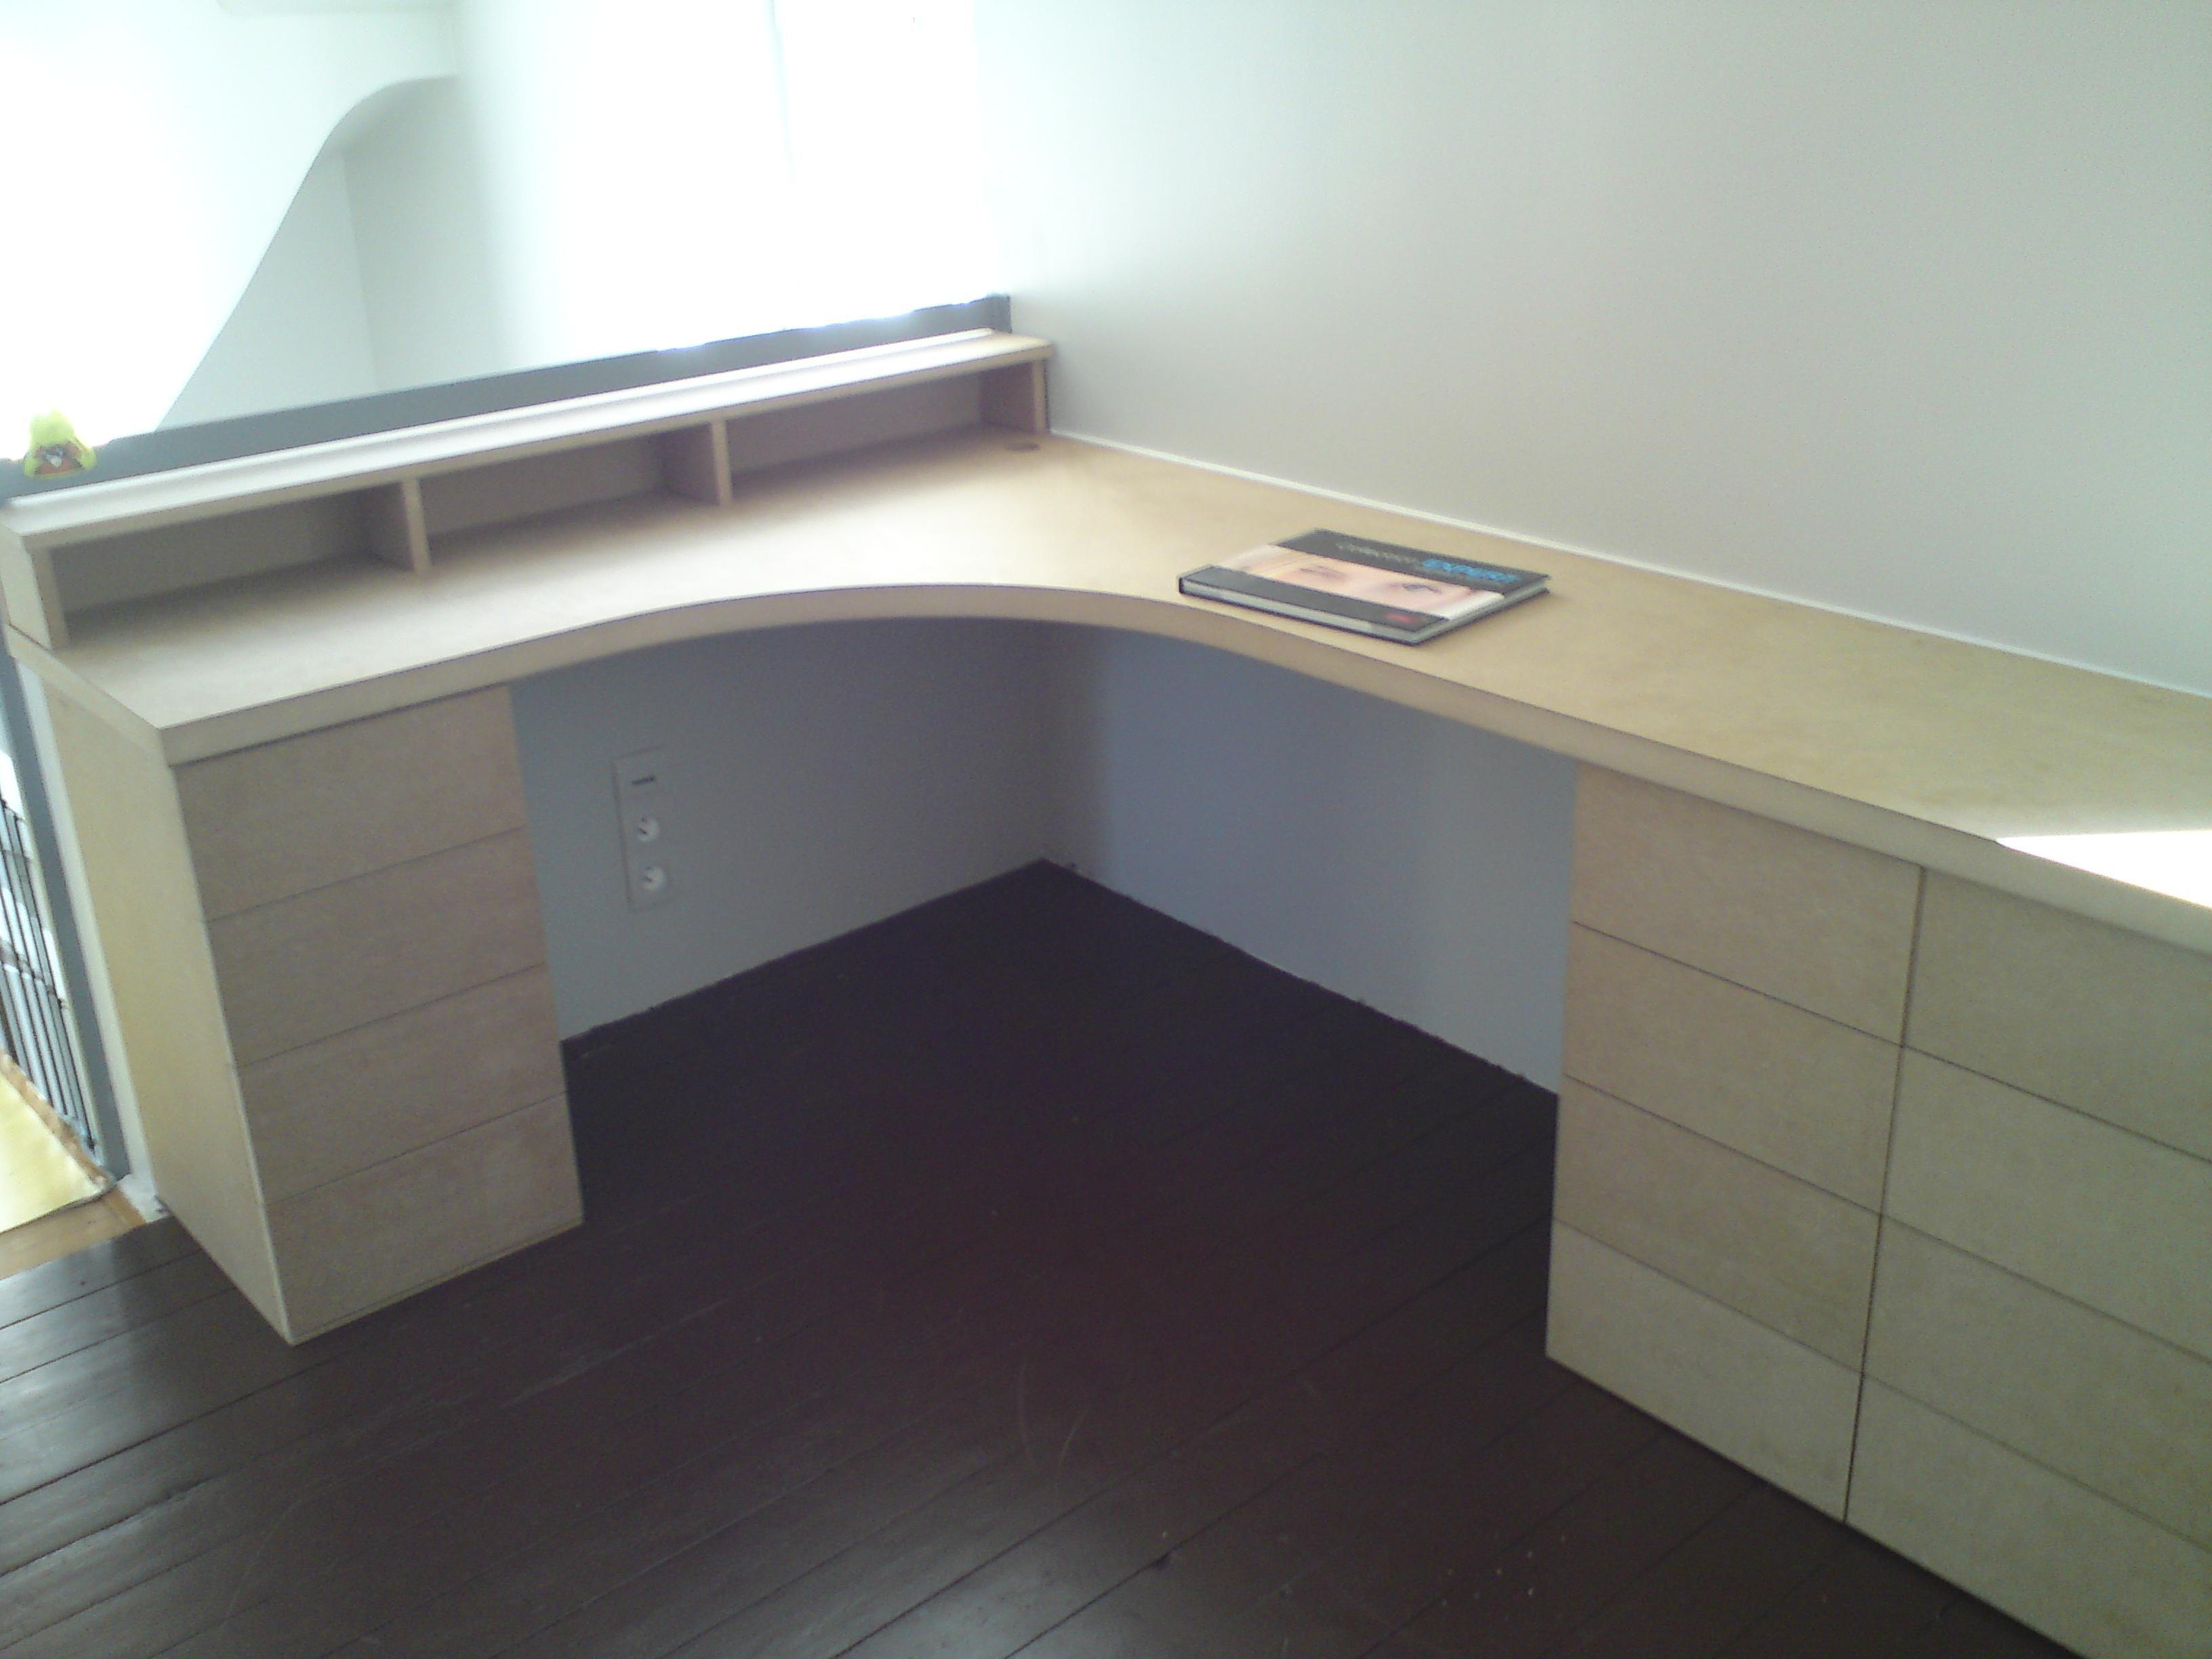 Bureau D Angle Sur Mesure Recherche Google Design Interior